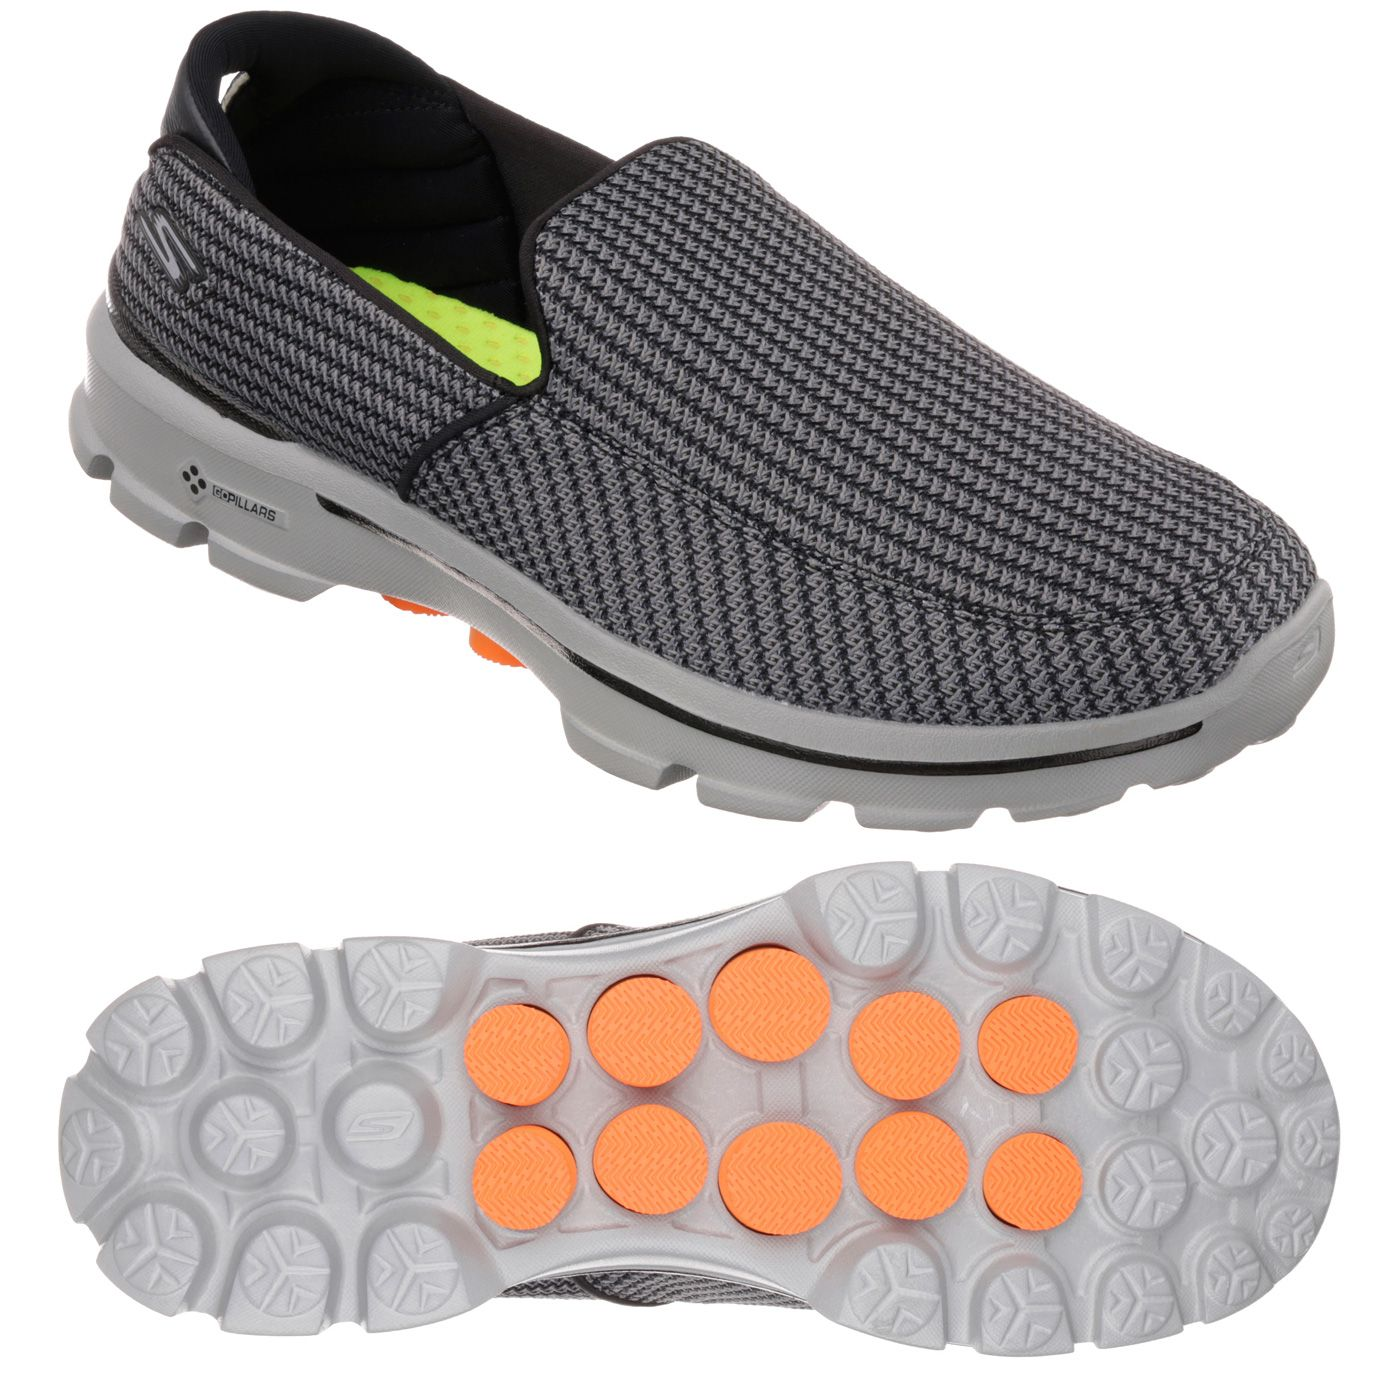 Skechers Go Walk 3 Mens Walking Shoes Ss16 Sweatband Com